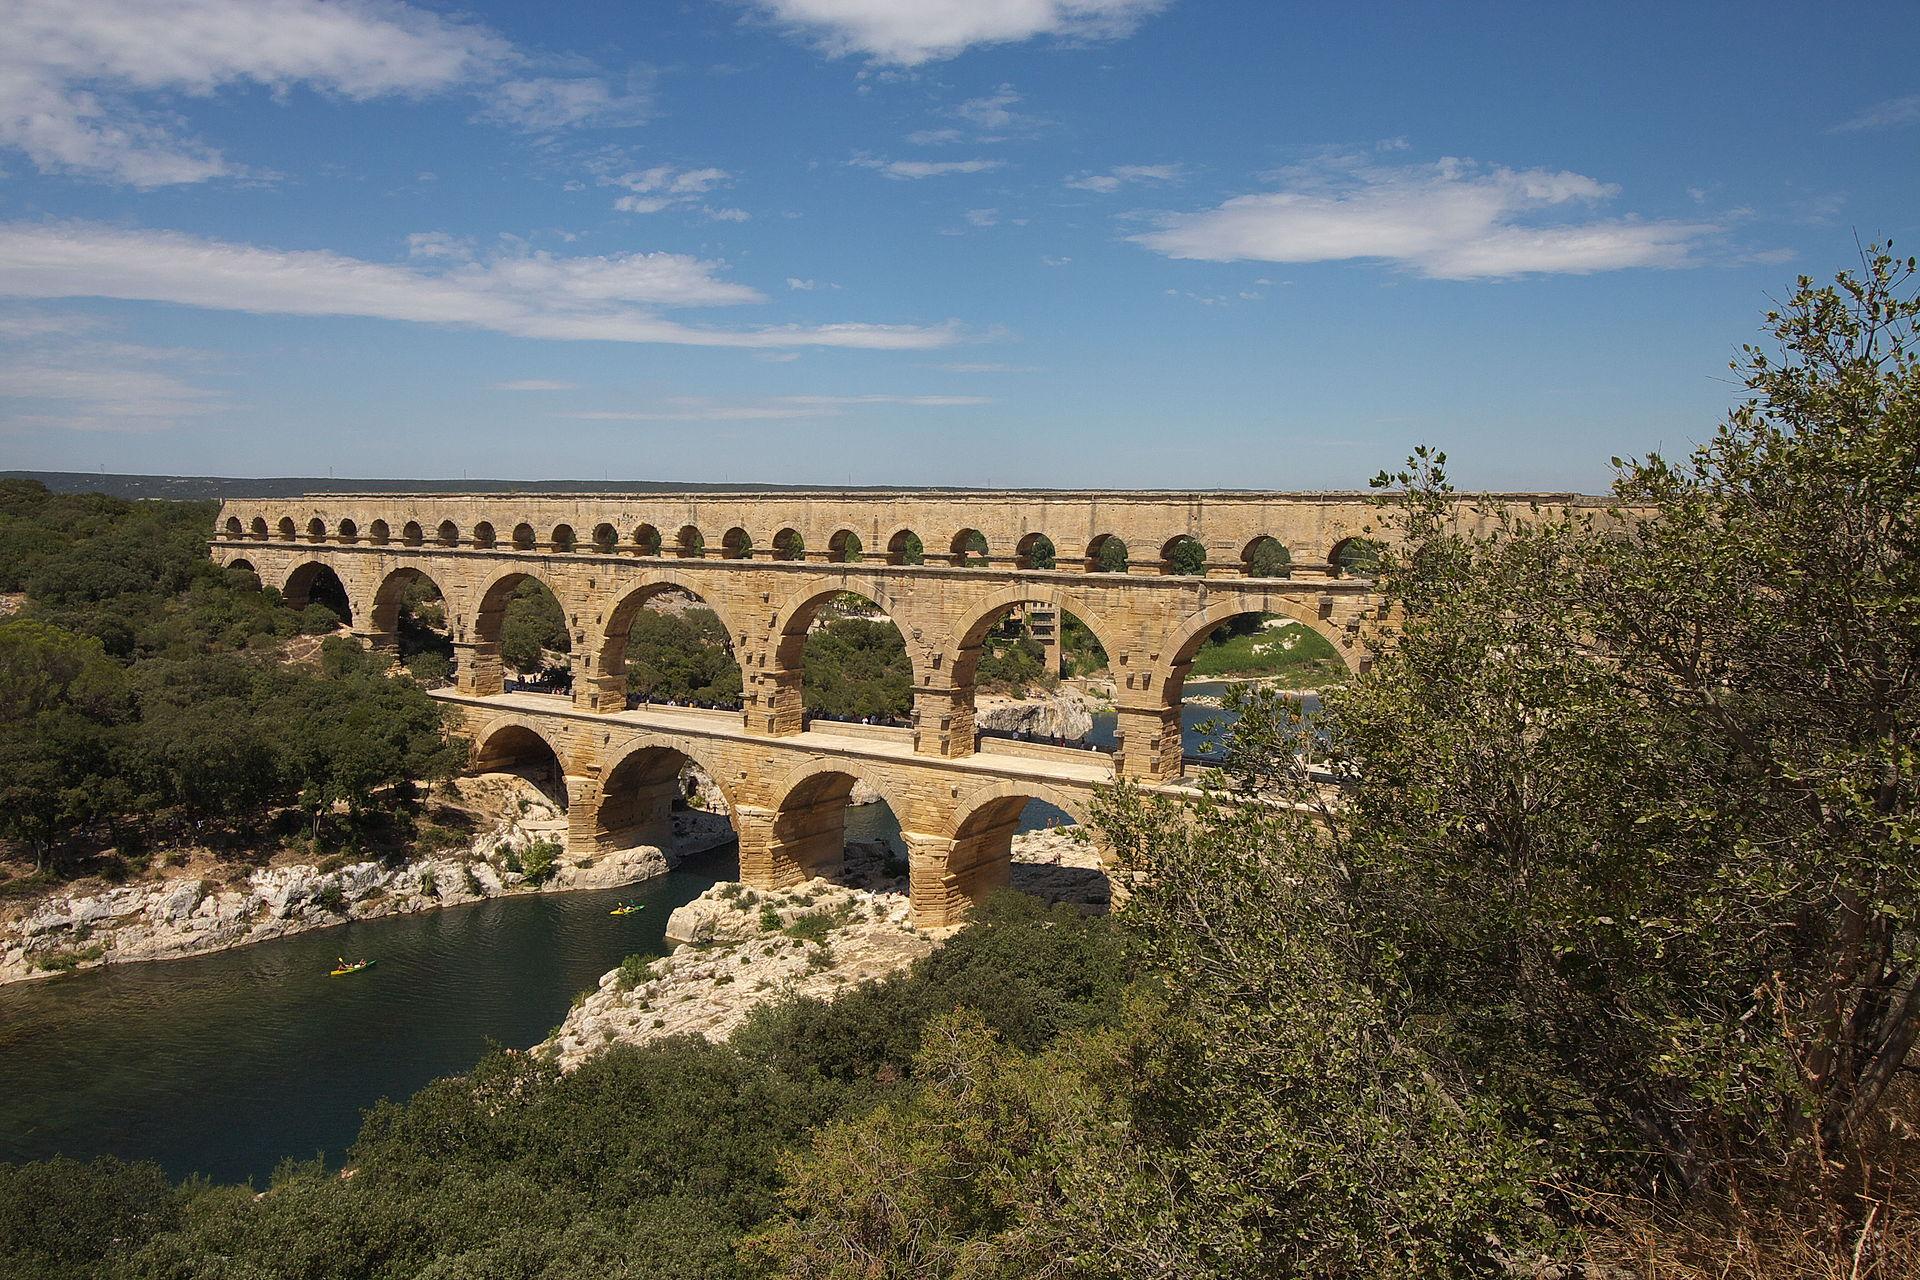 gard pont du vers wikipedia france famous inventions aqueduct most roman five